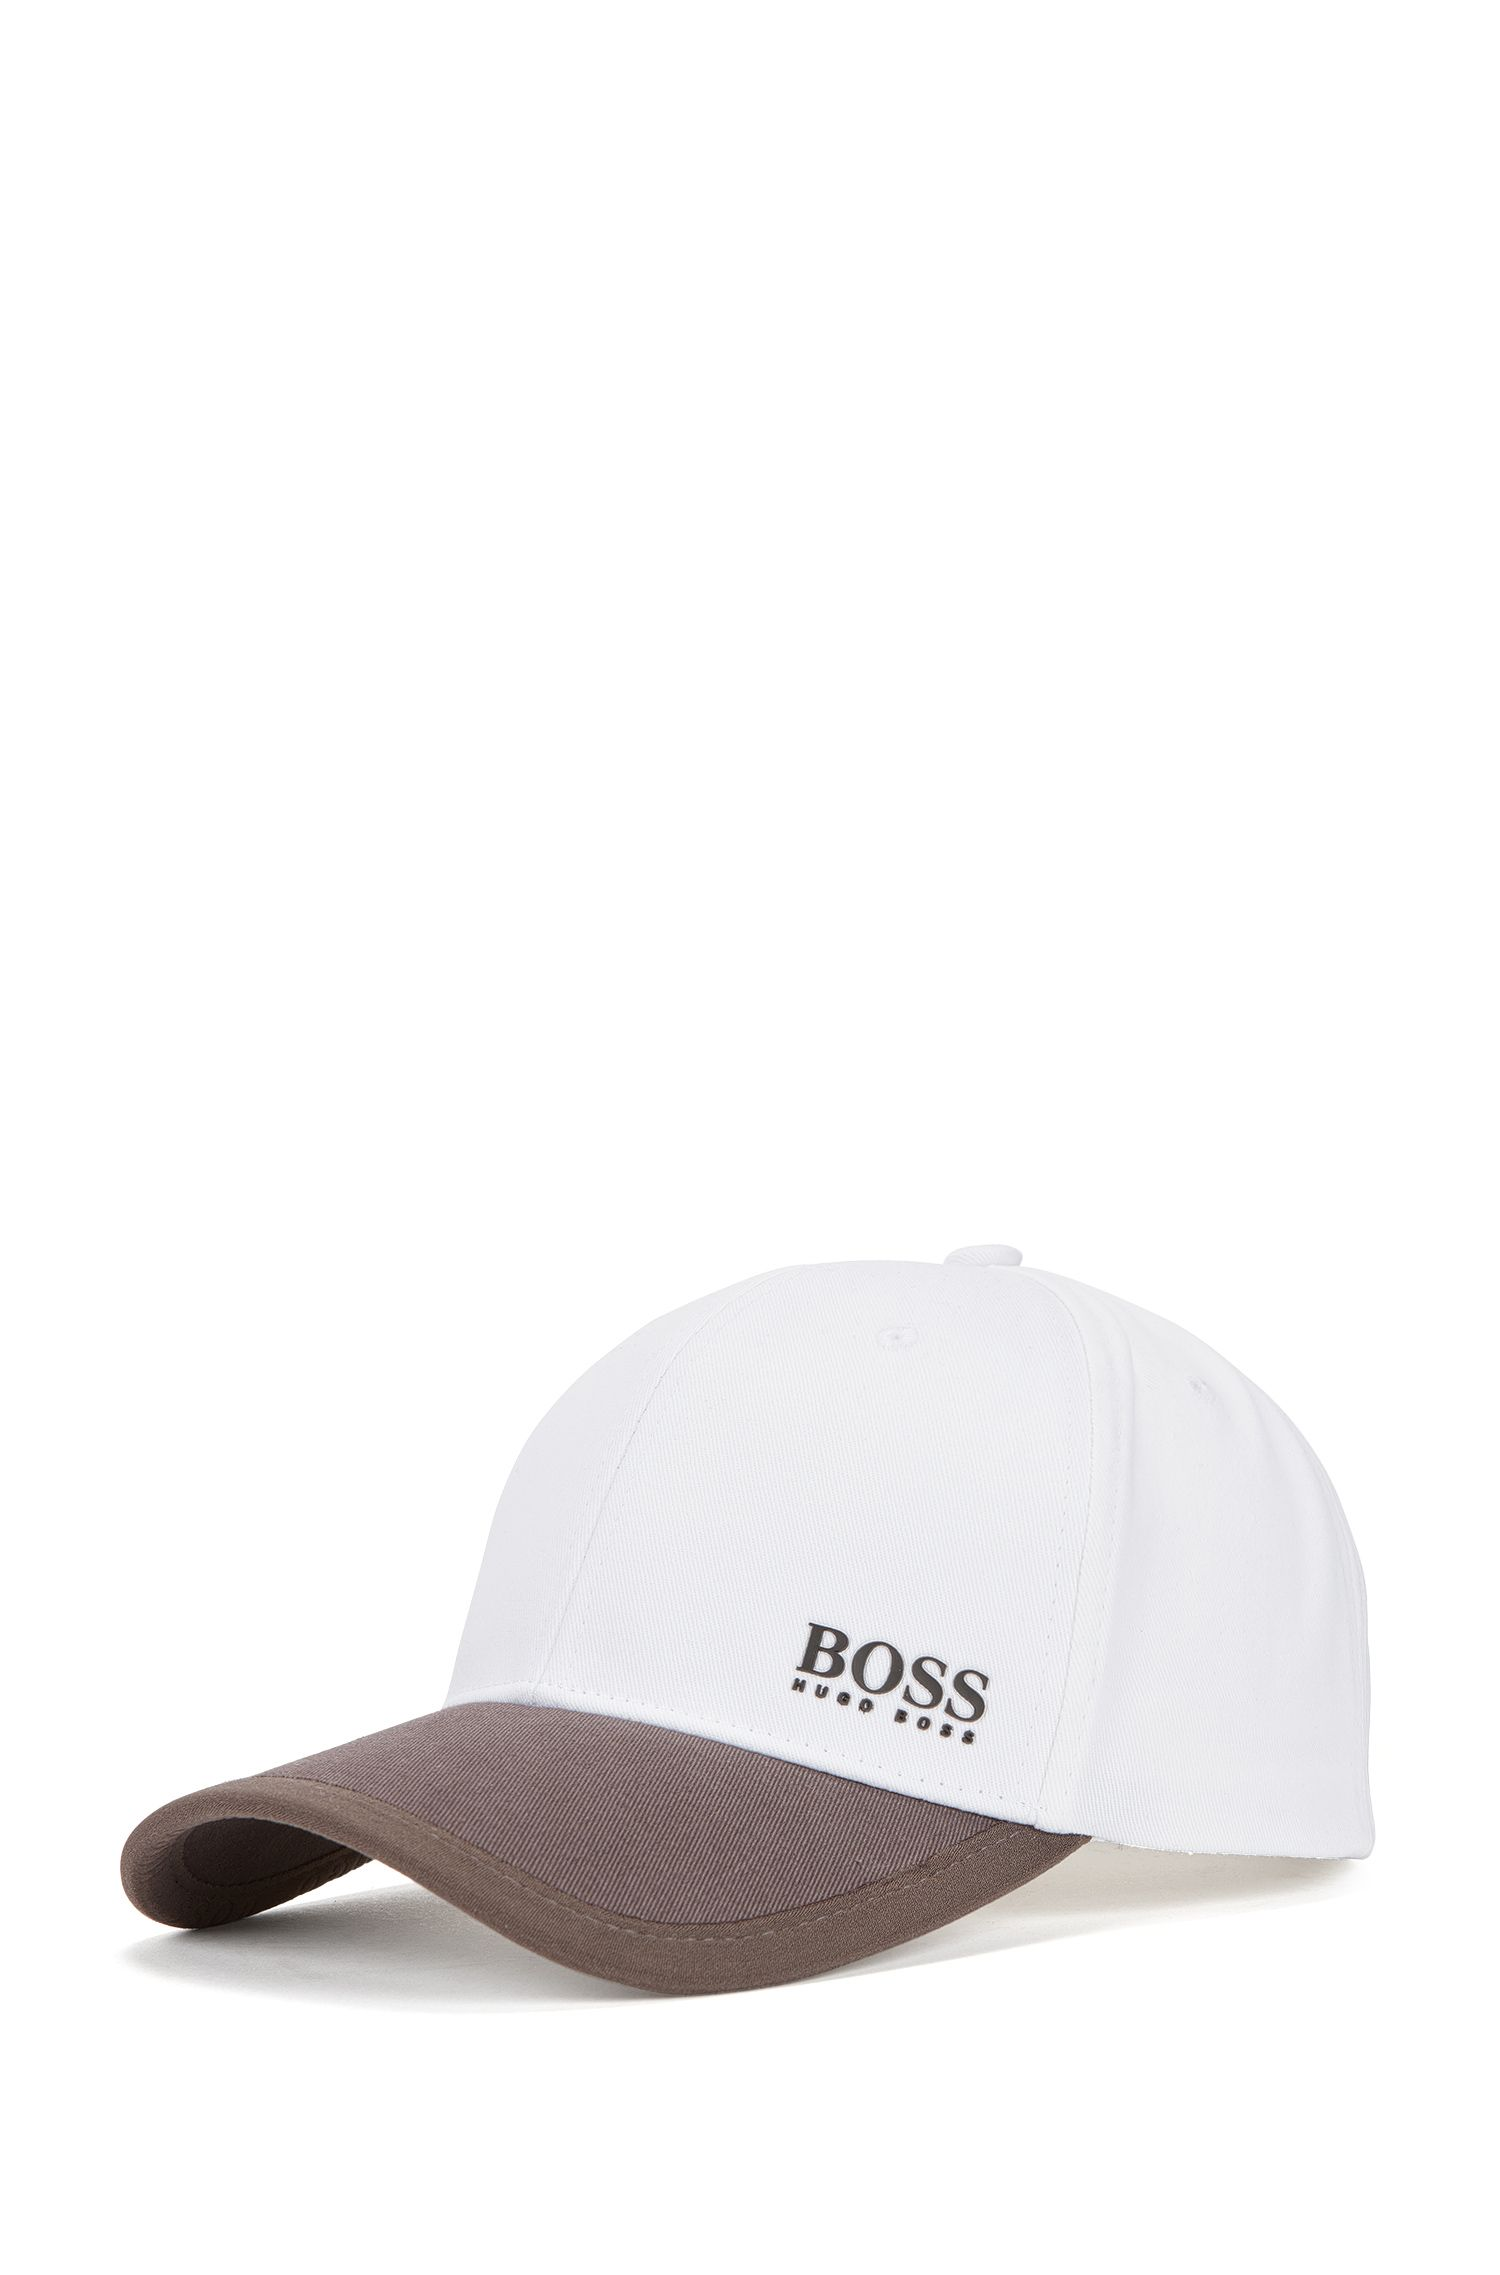 Cotton Twill Baseball Cap | Cap, Natural